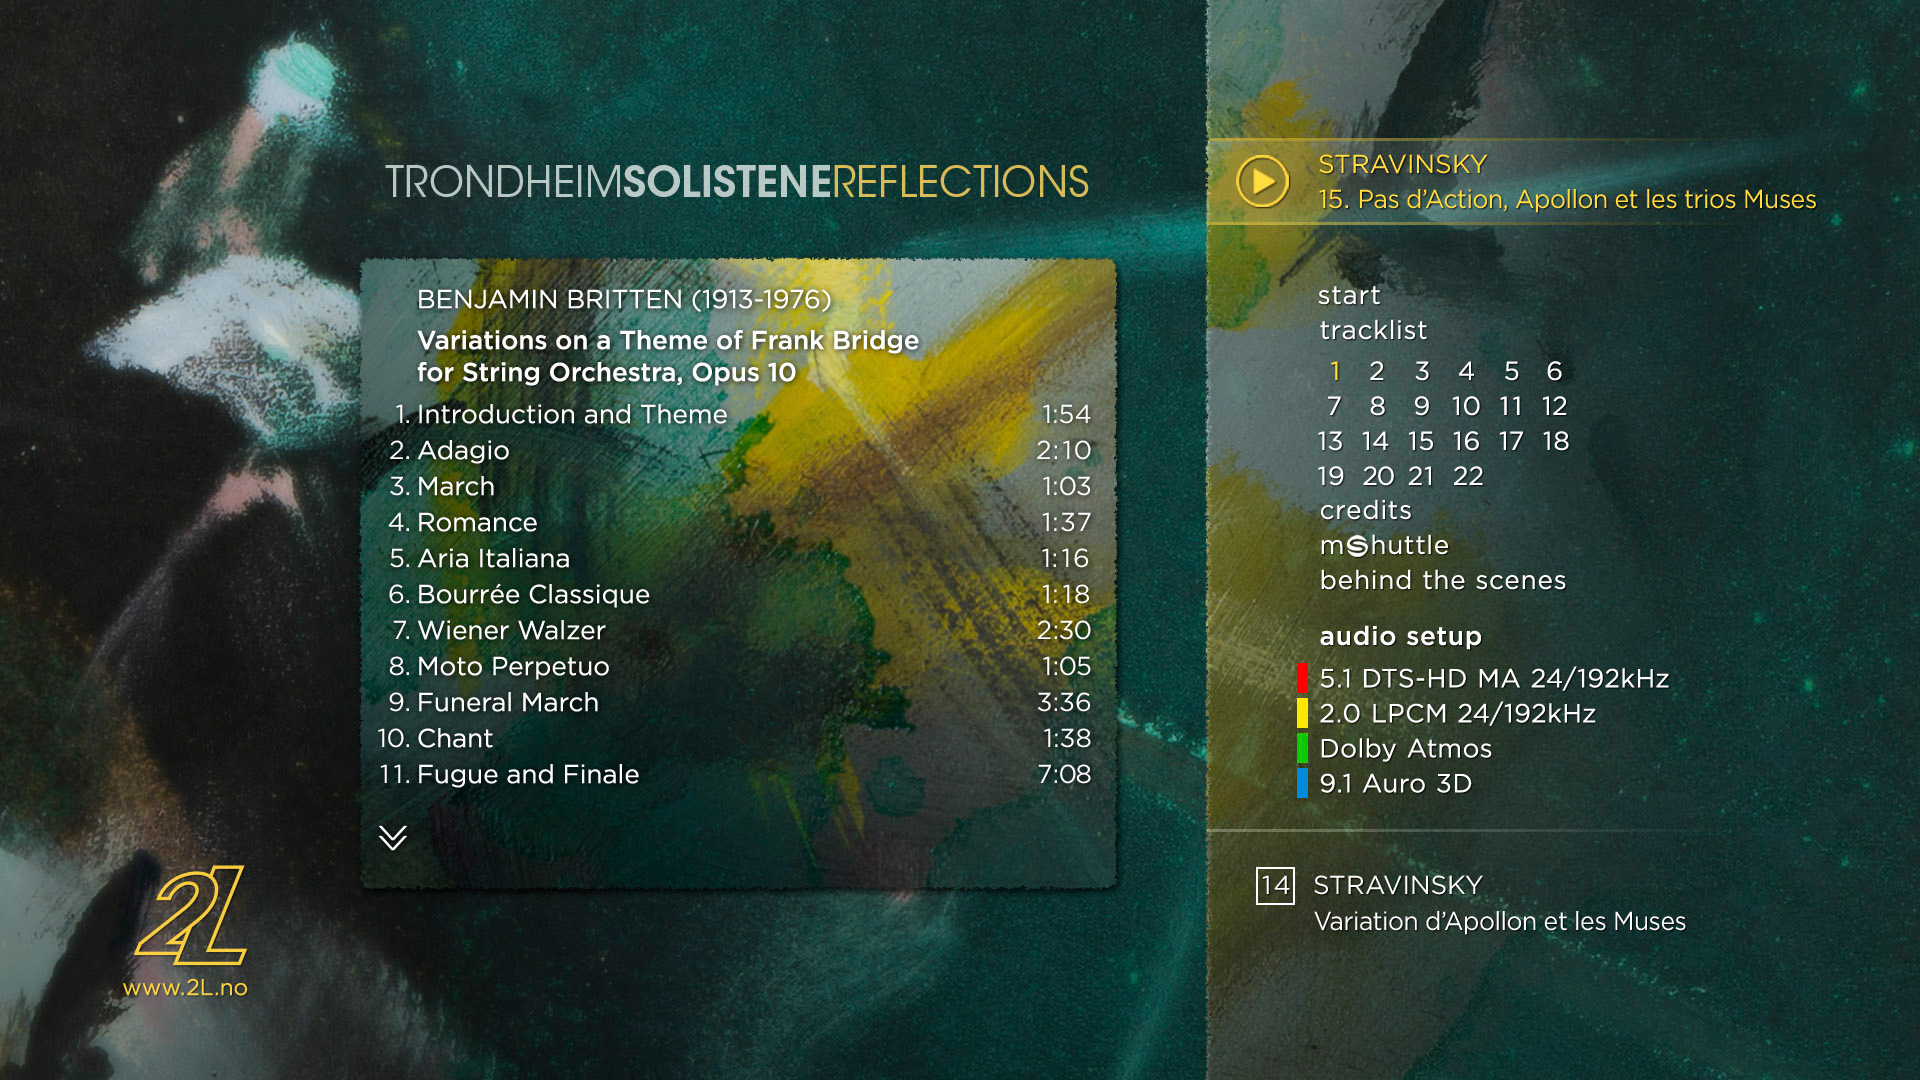 Album: REFLECTIONS (2L-125-SABD) TrondheimSolistene